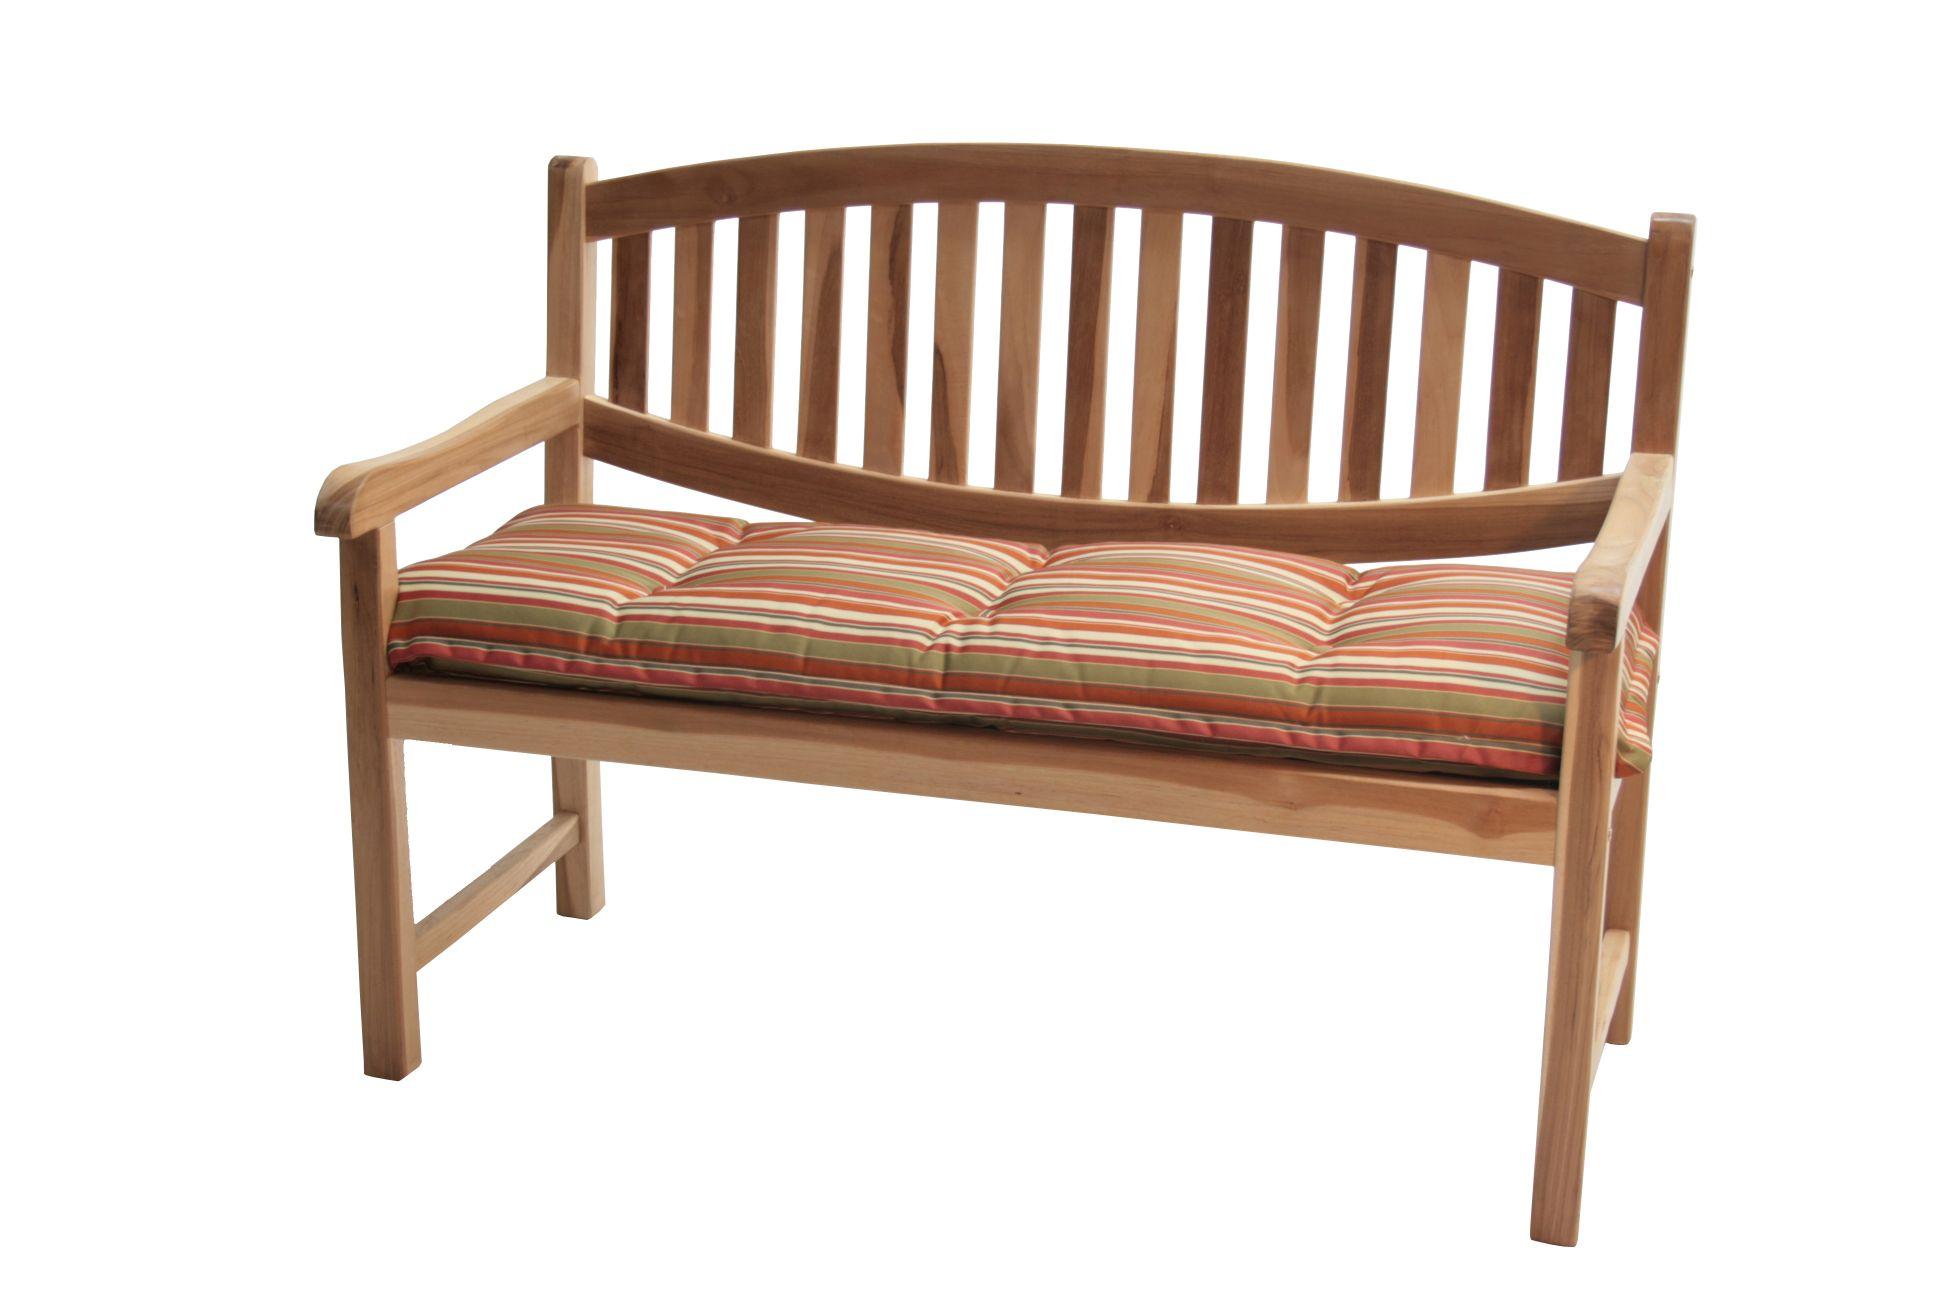 polster f r b nke polster auflagen ihr online shop f r hochwertige. Black Bedroom Furniture Sets. Home Design Ideas